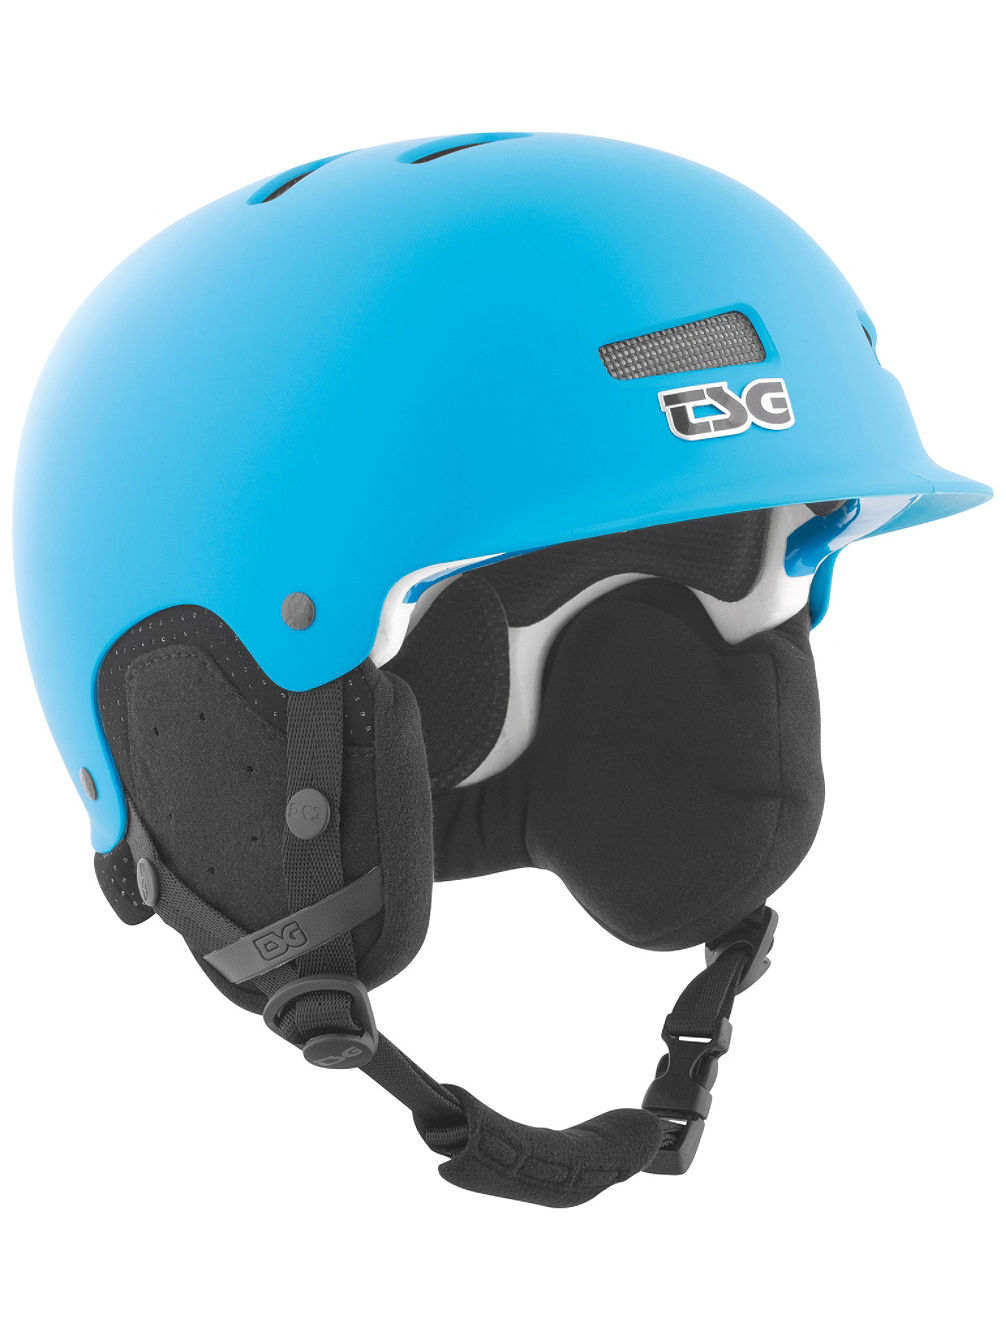 tsg-trophy-solid-color-helmet